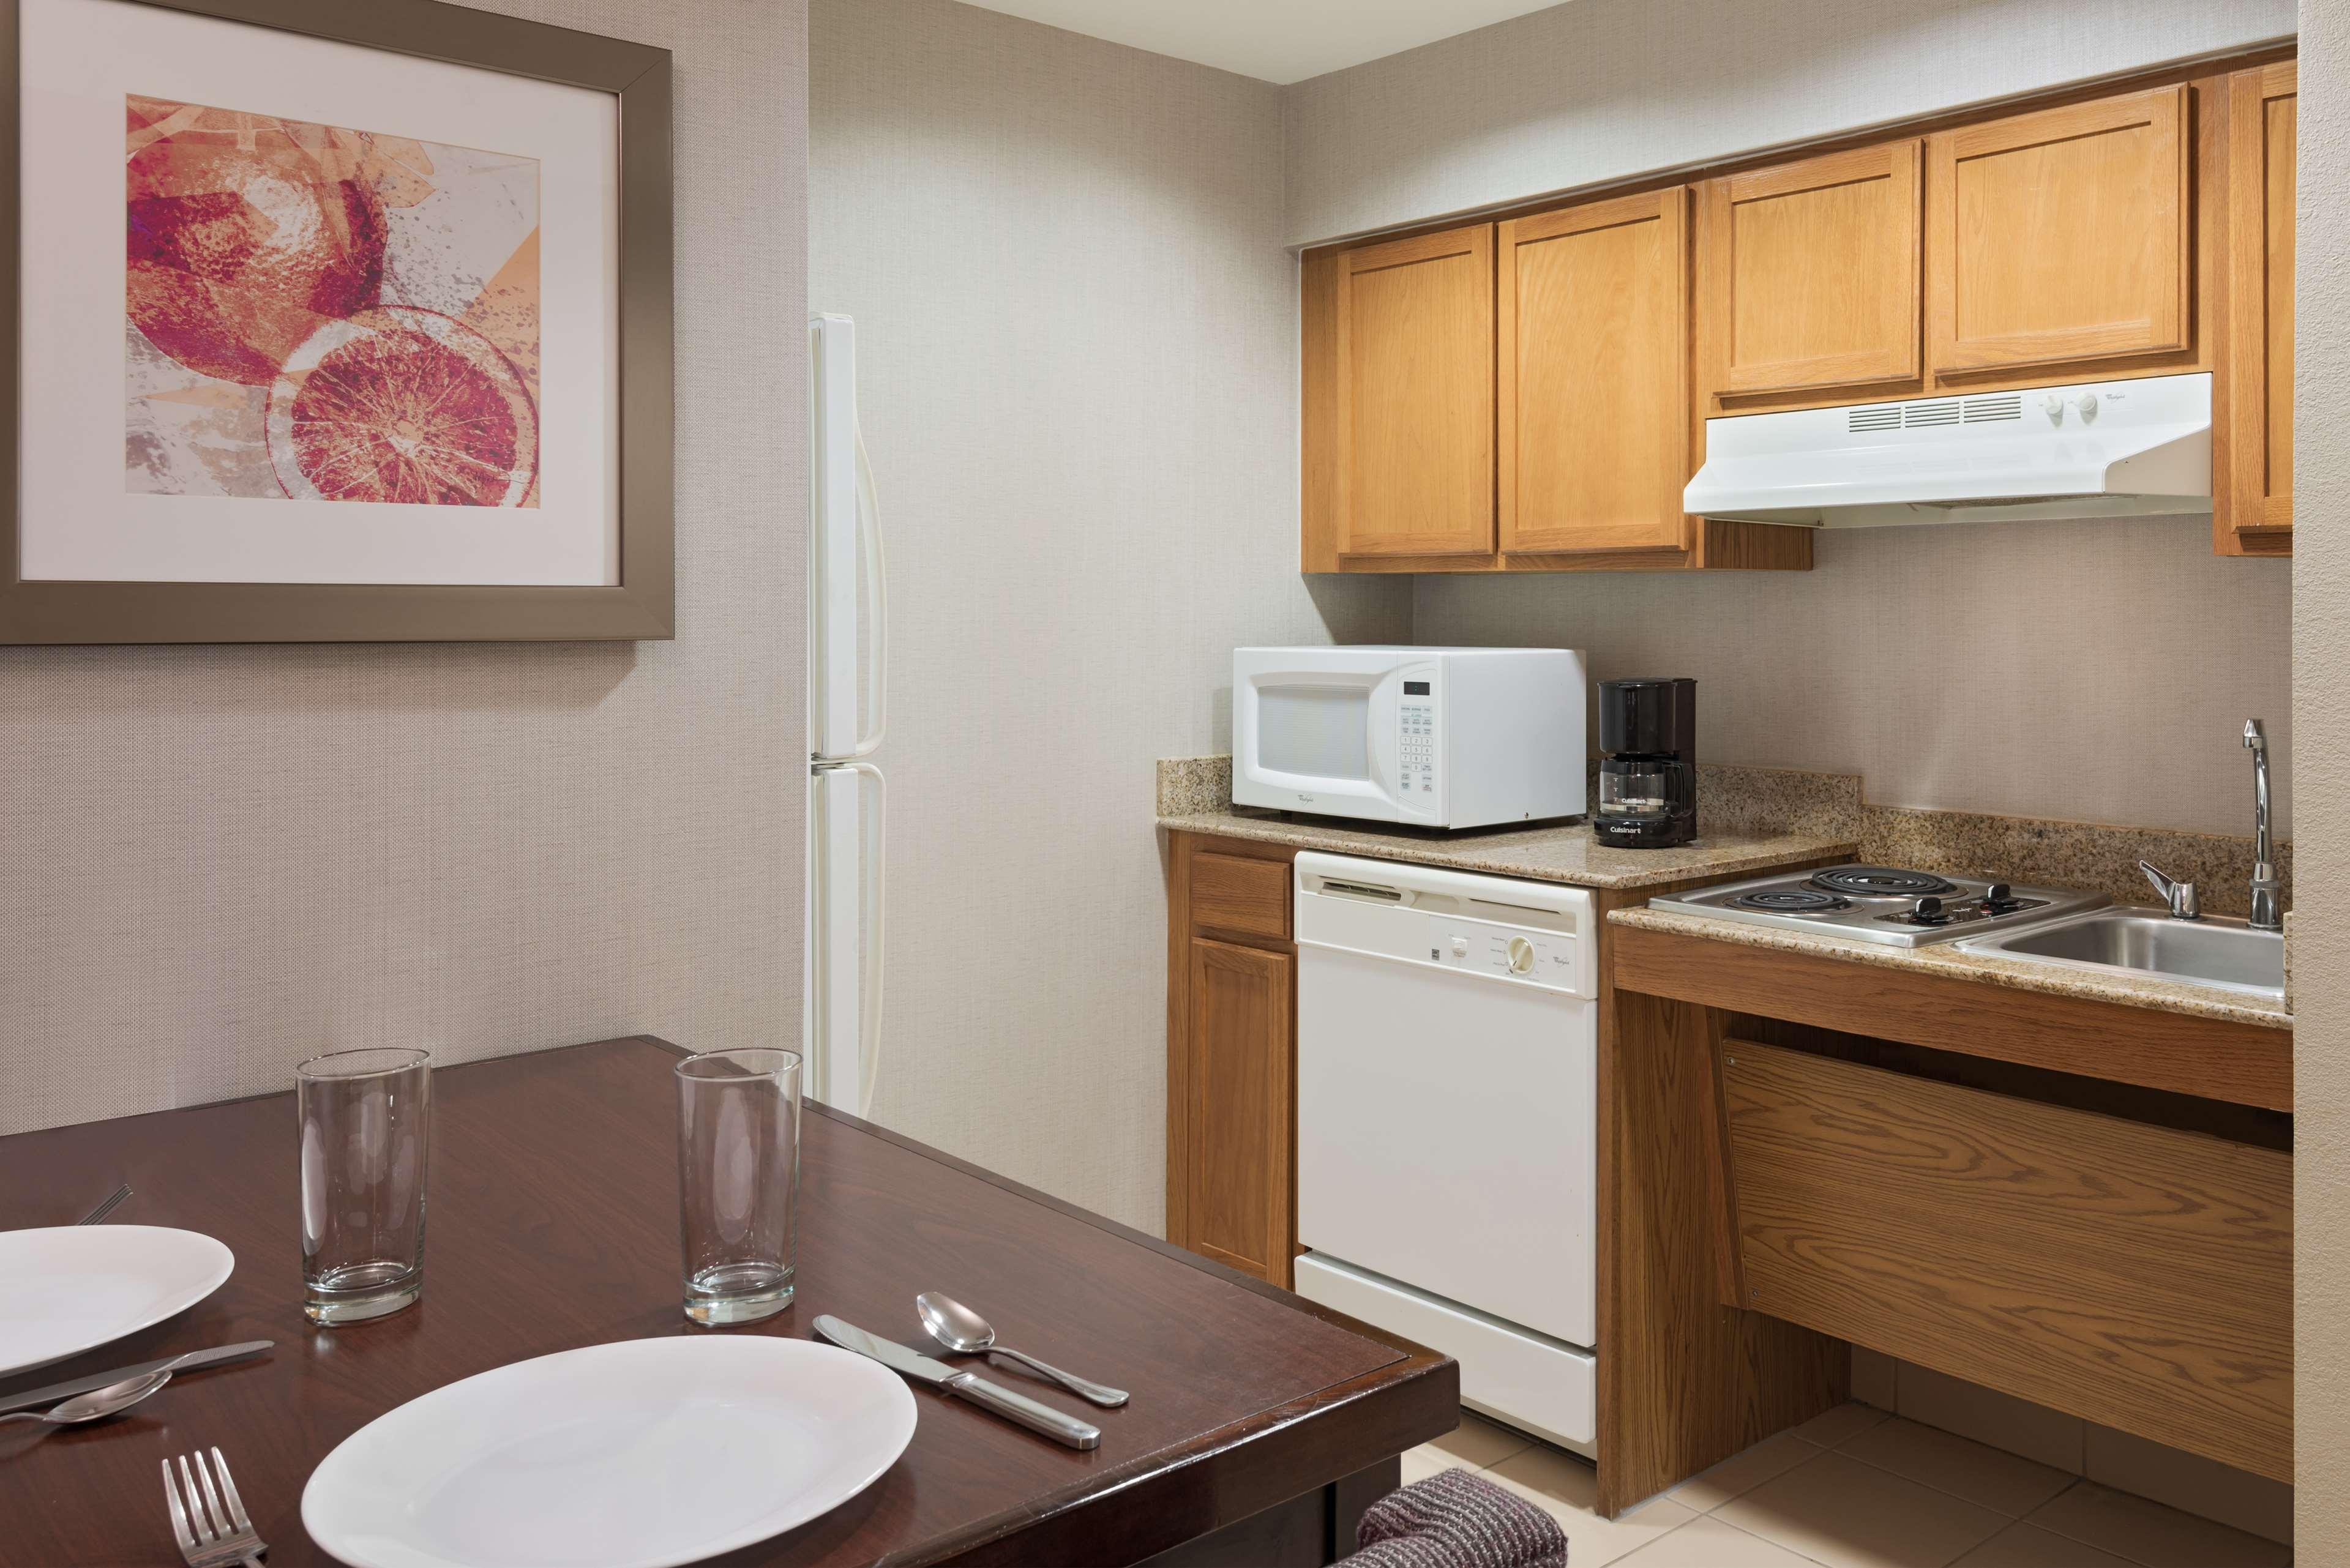 Homewood Suites by Hilton Orlando-UCF Area image 17